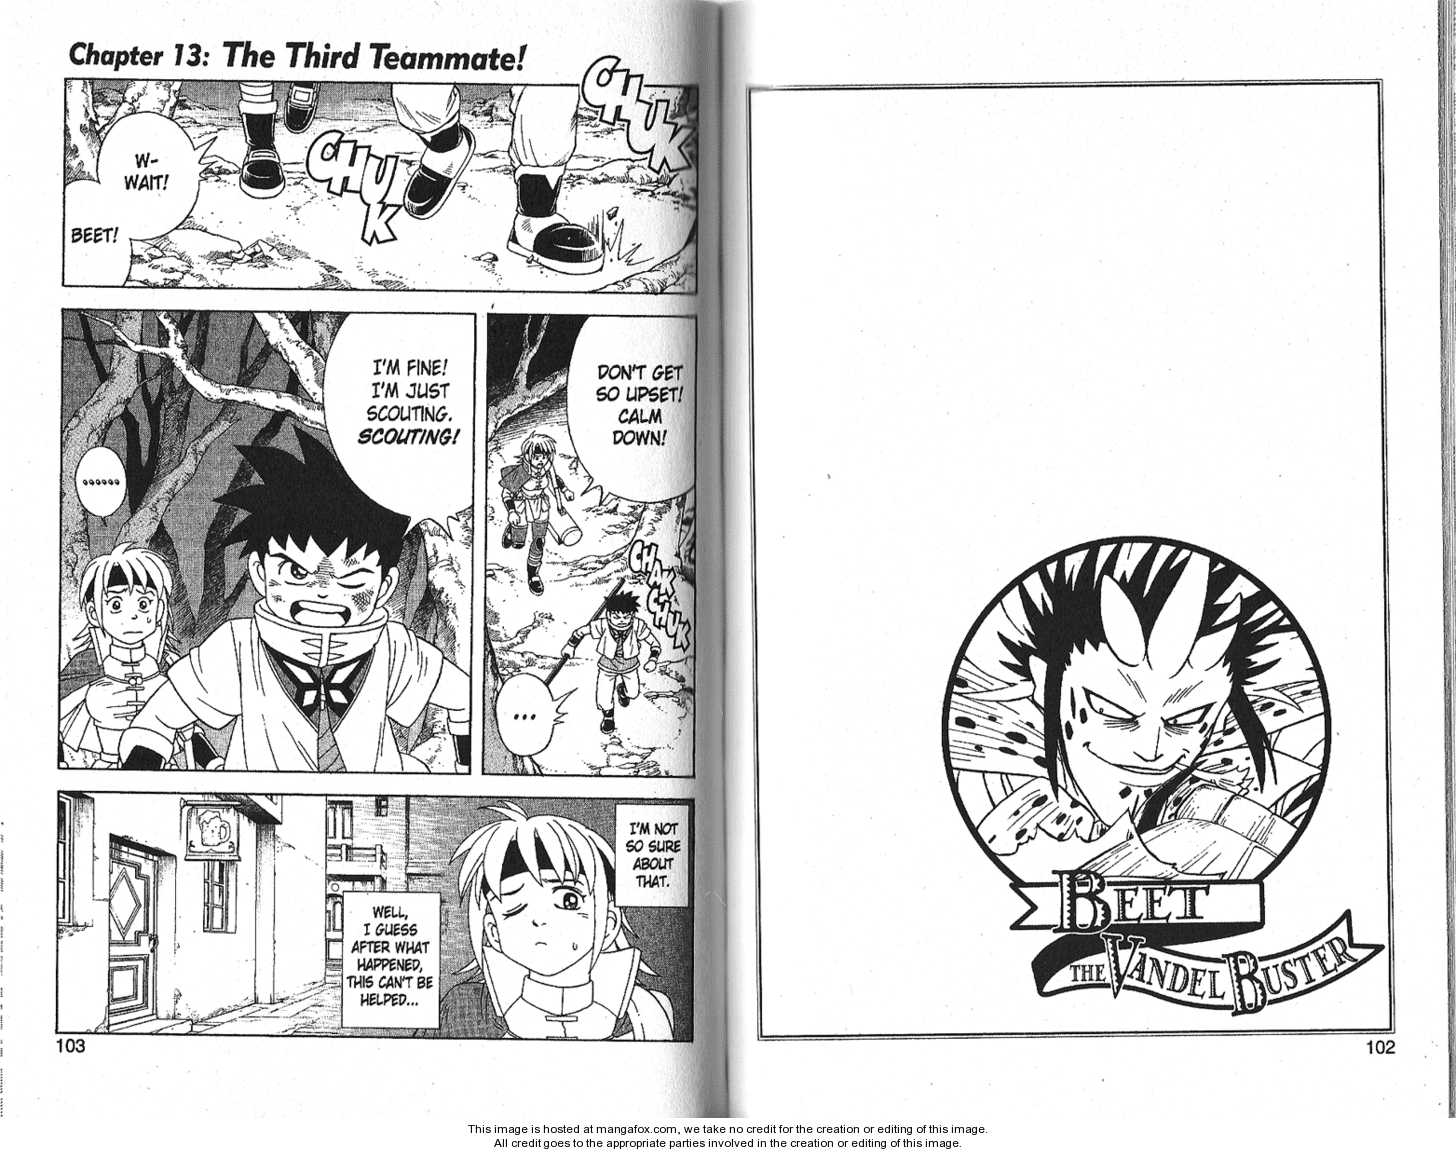 Beet the Vandel Buster 13 Page 1